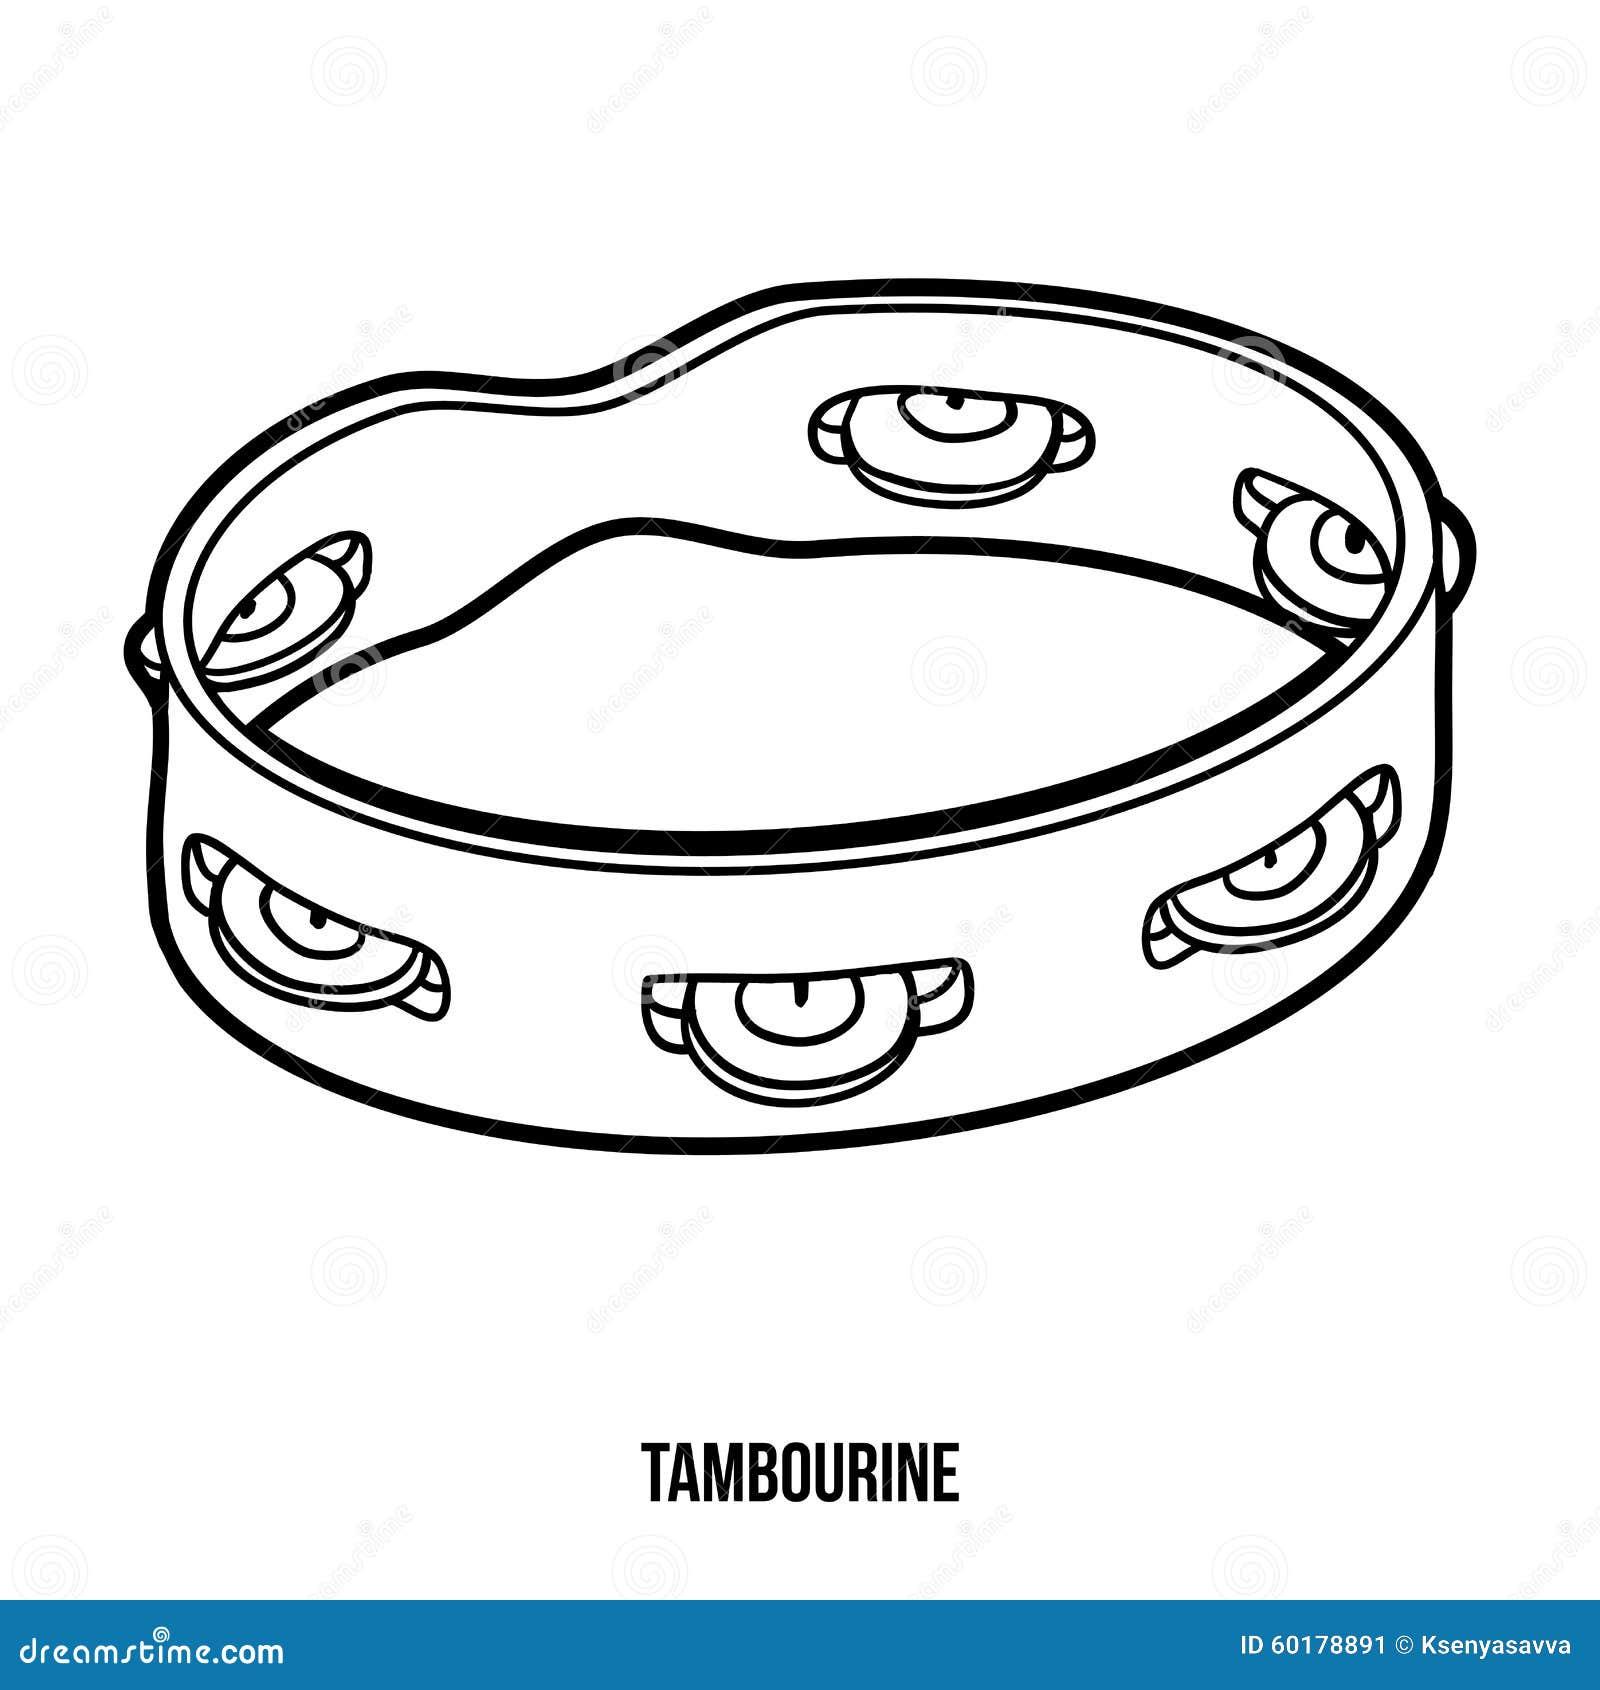 The Black Tambourines The Black Tambourines